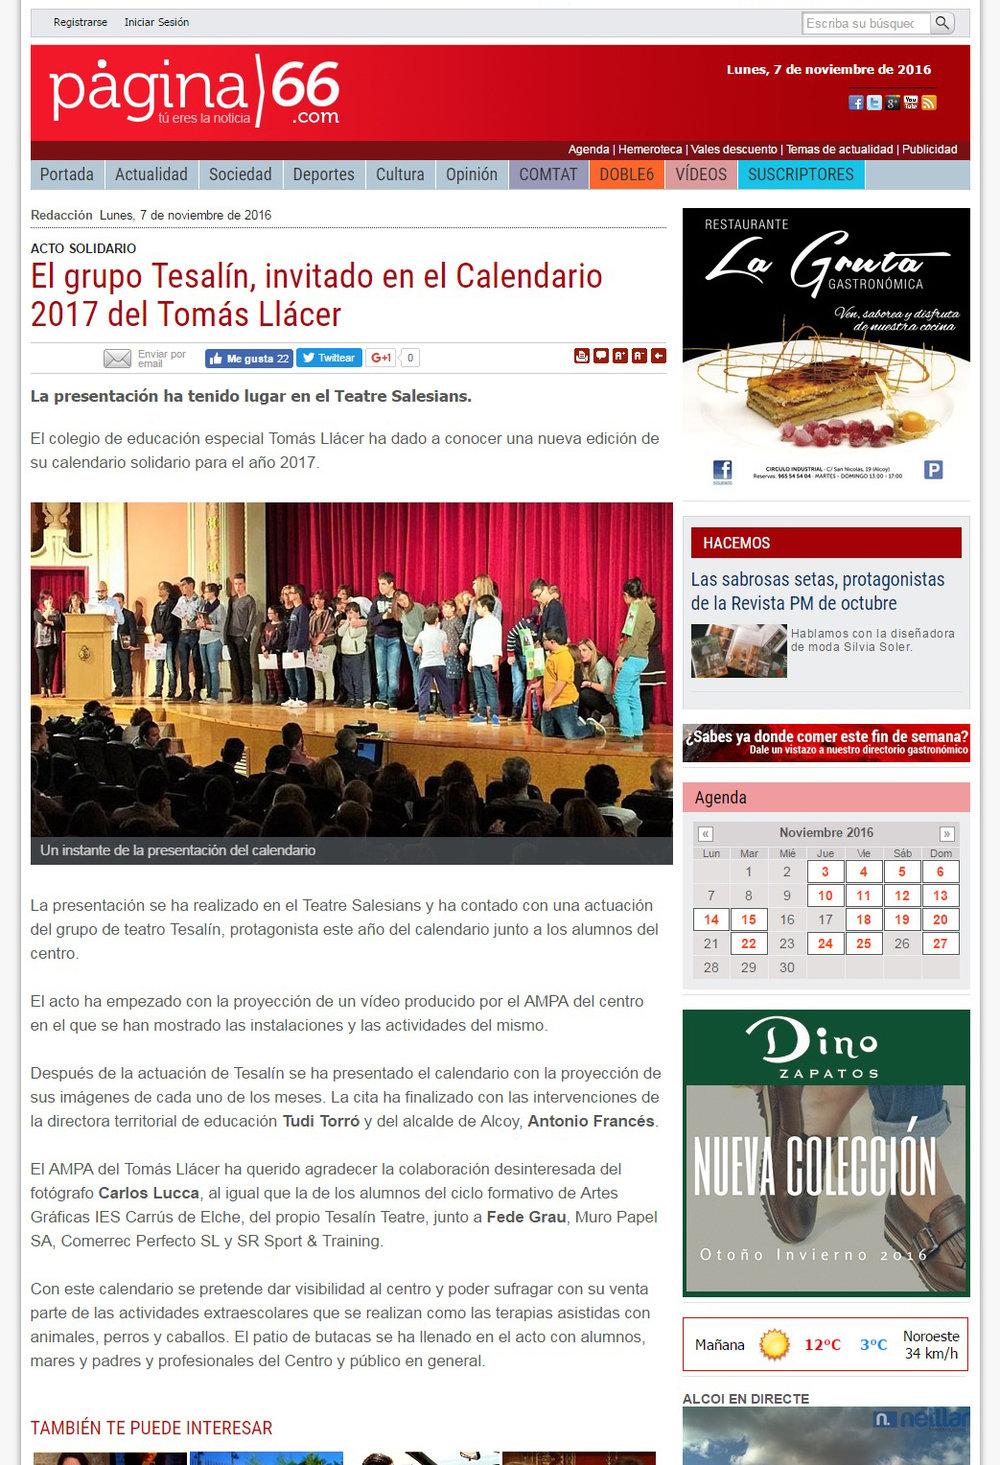 Portada_Pagina_66_2016.jpg